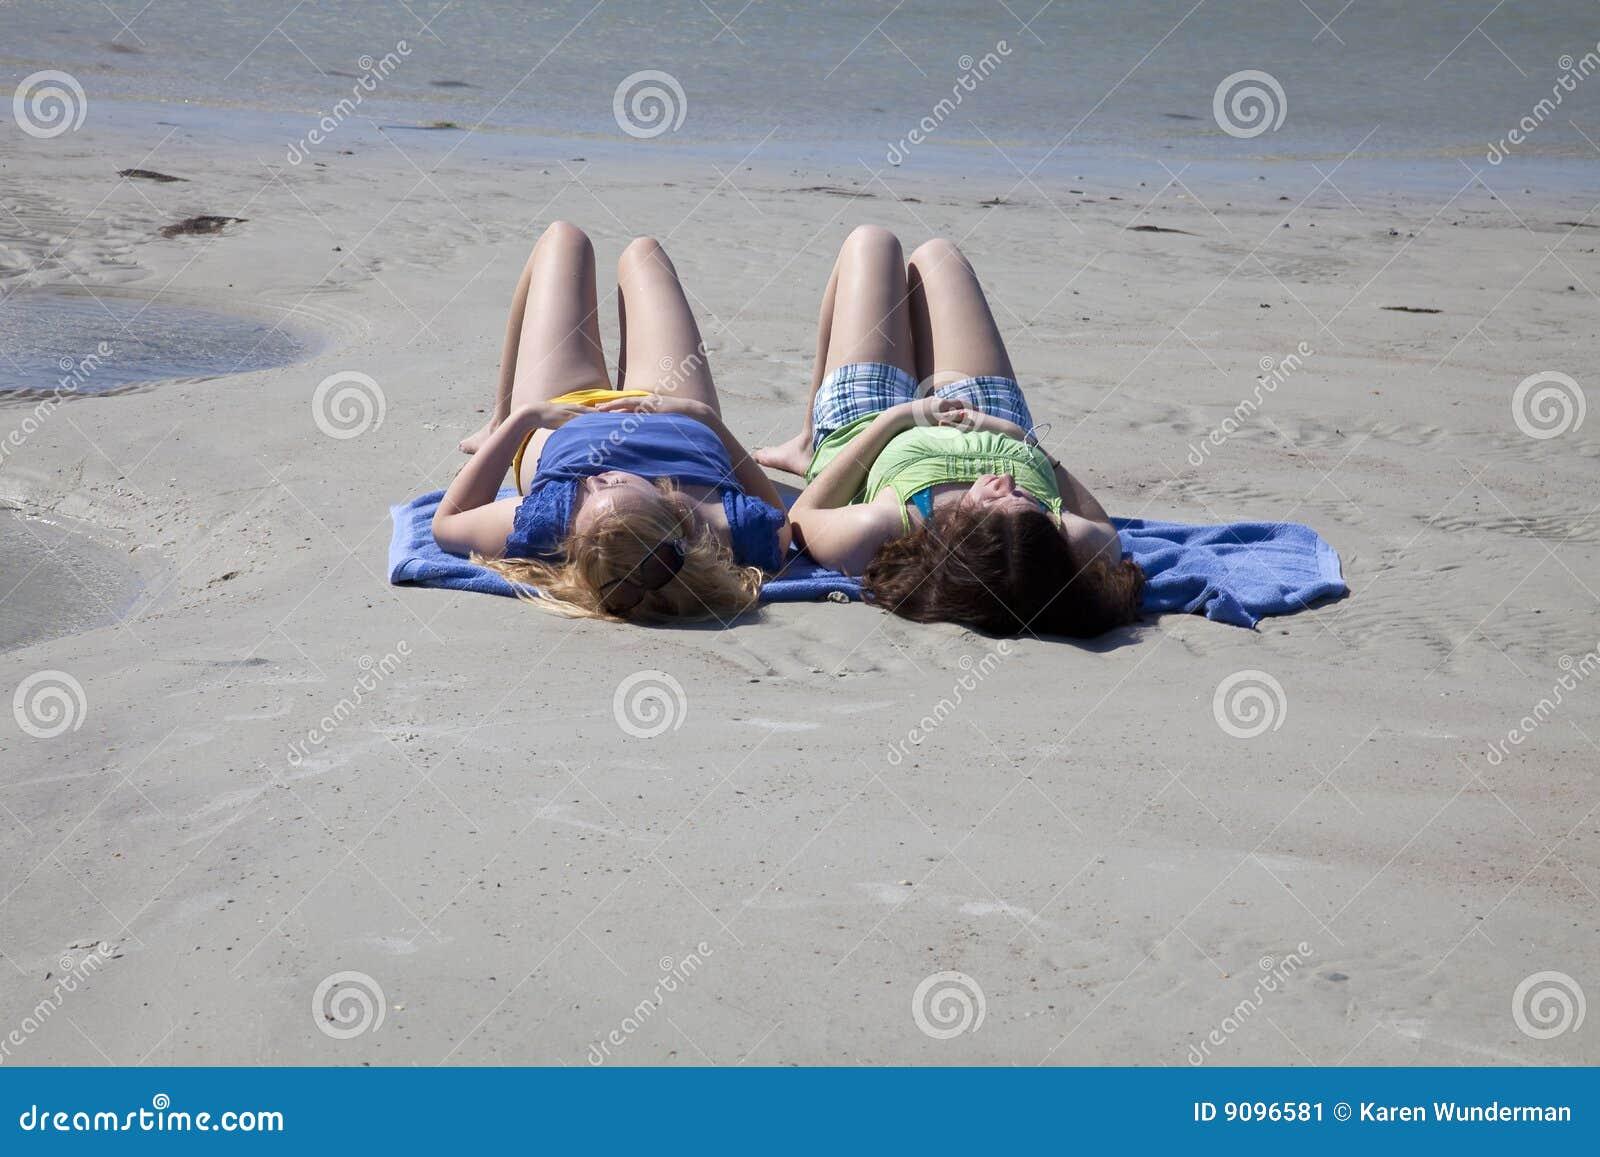 sunbathing beach girls Teen on